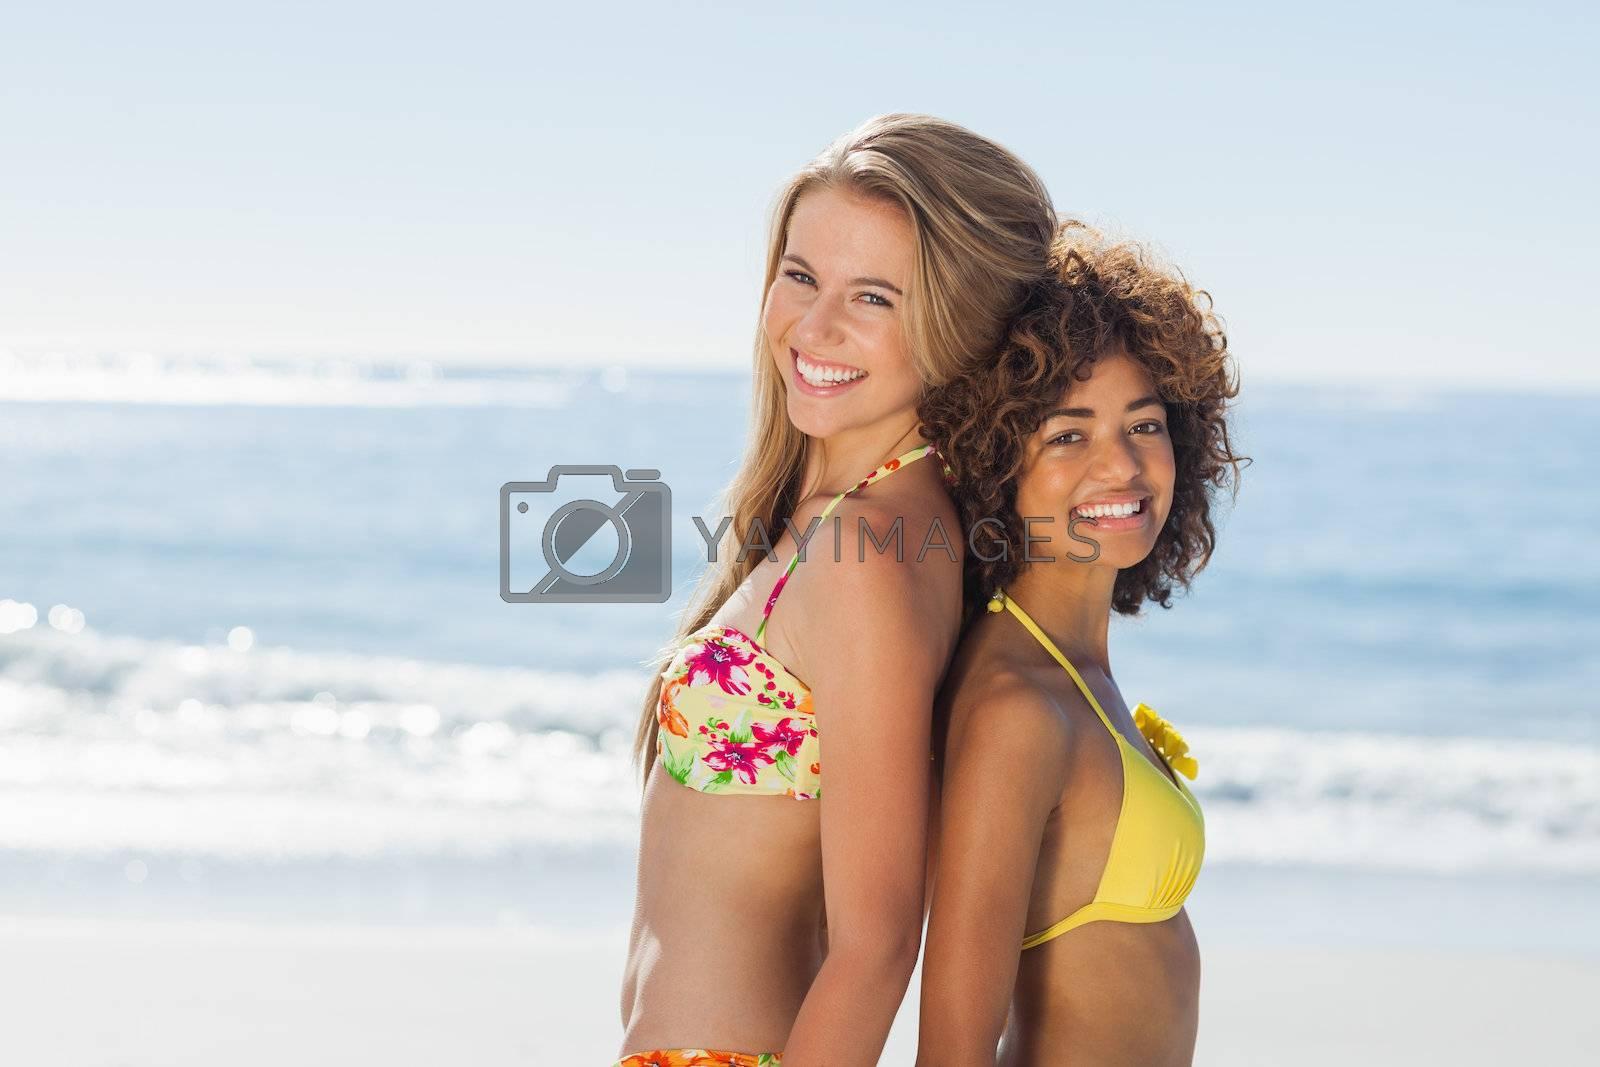 Smiling friends in bikinis standing back-to-back by Wavebreakmedia